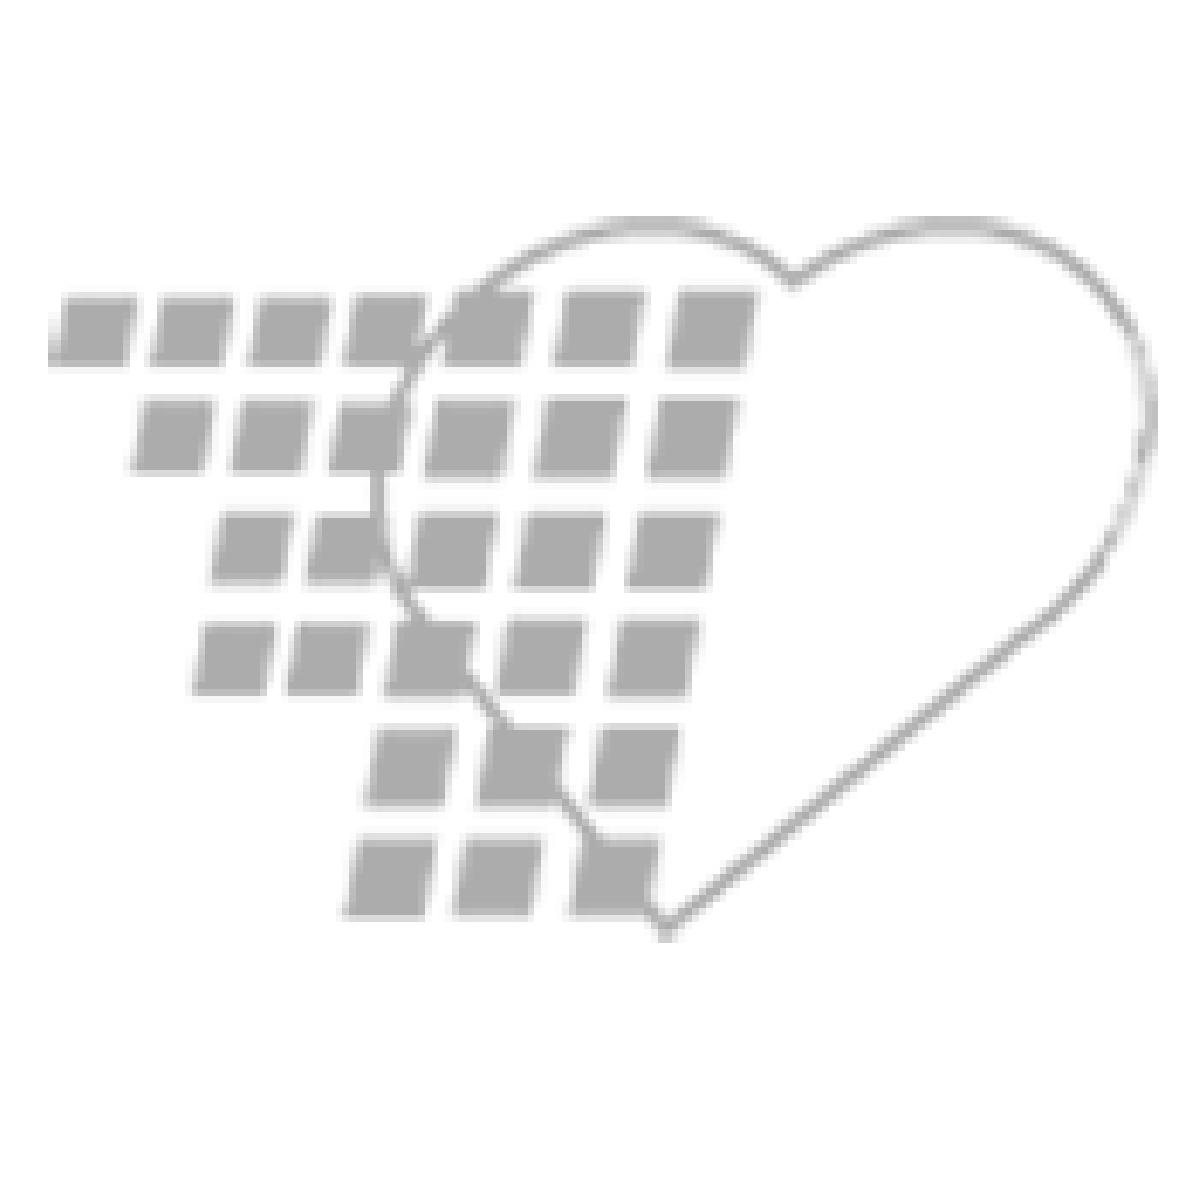 07-71-0006P Shiley Tracheostomy Tube #6 - Cuffless with Inner Cannula